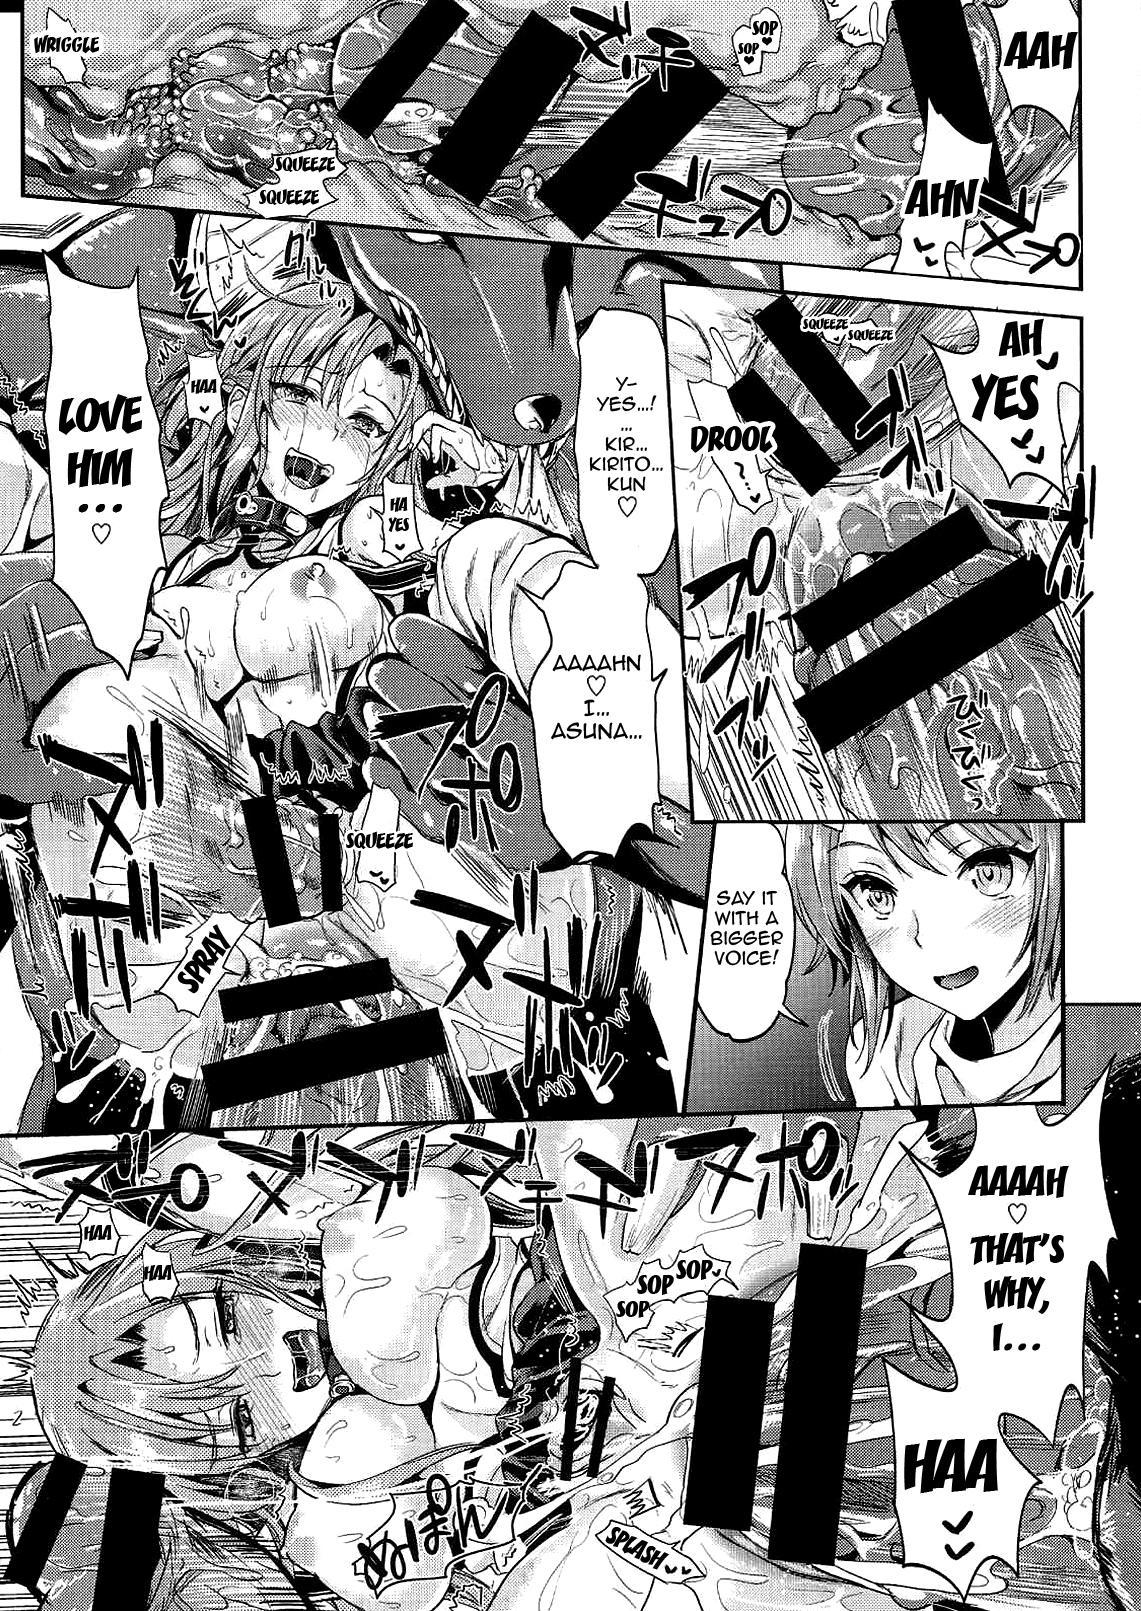 [YURIRU-RARIKA (Kojima Saya, Lazu)] Shujou Seikou 2 Bangai-hen | Captive Sex 2 - Extra Chapter (Sword Art Online) [English] {doujin-moe.us} 24